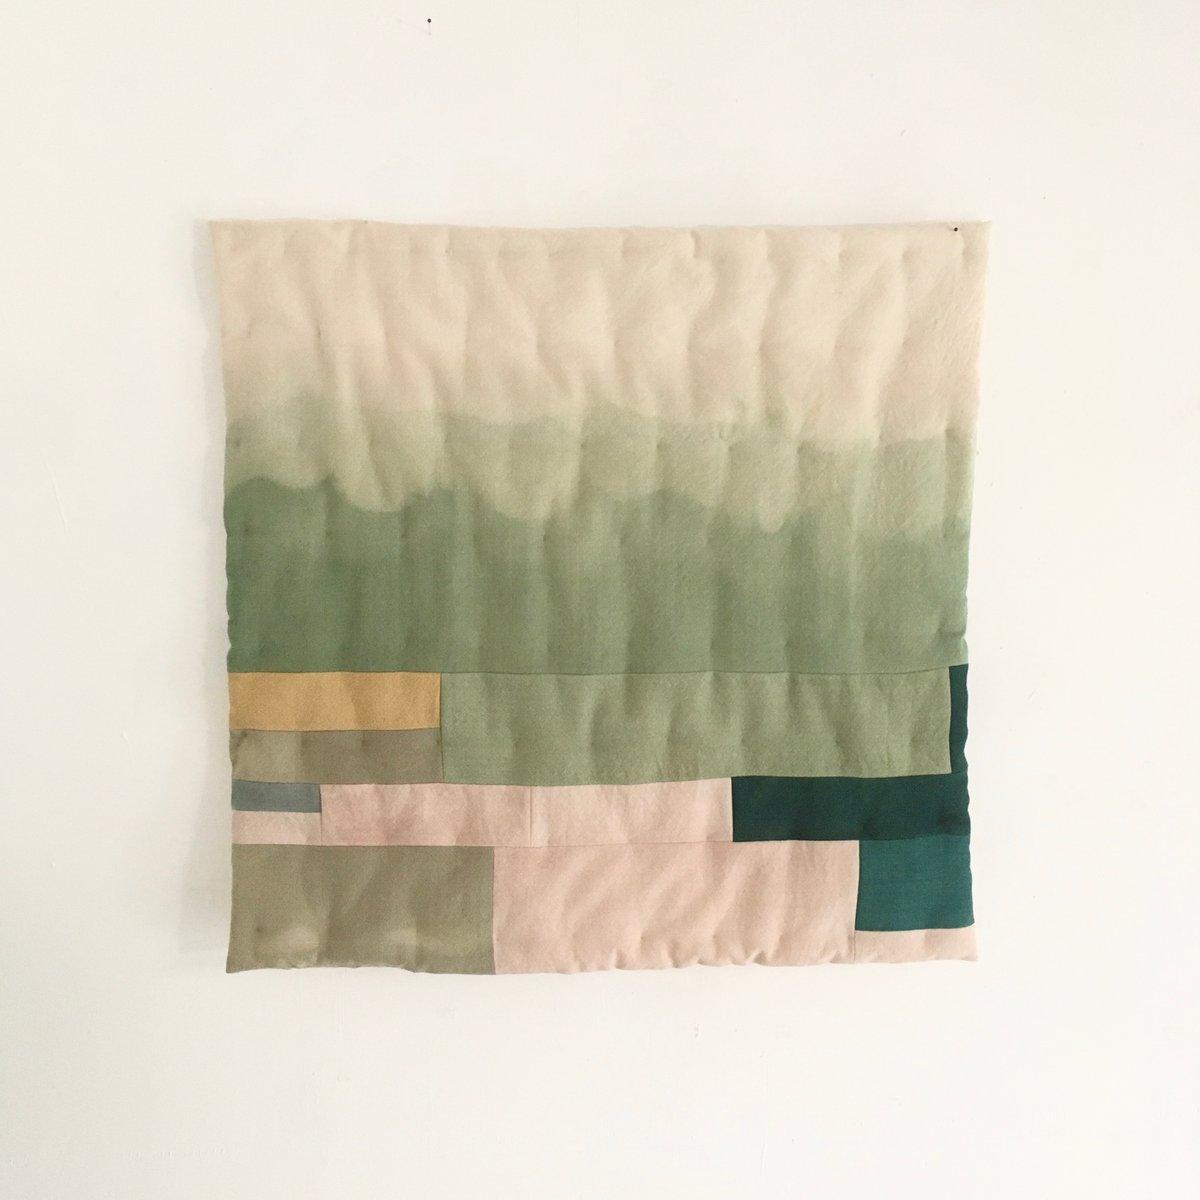 Image of rug 5